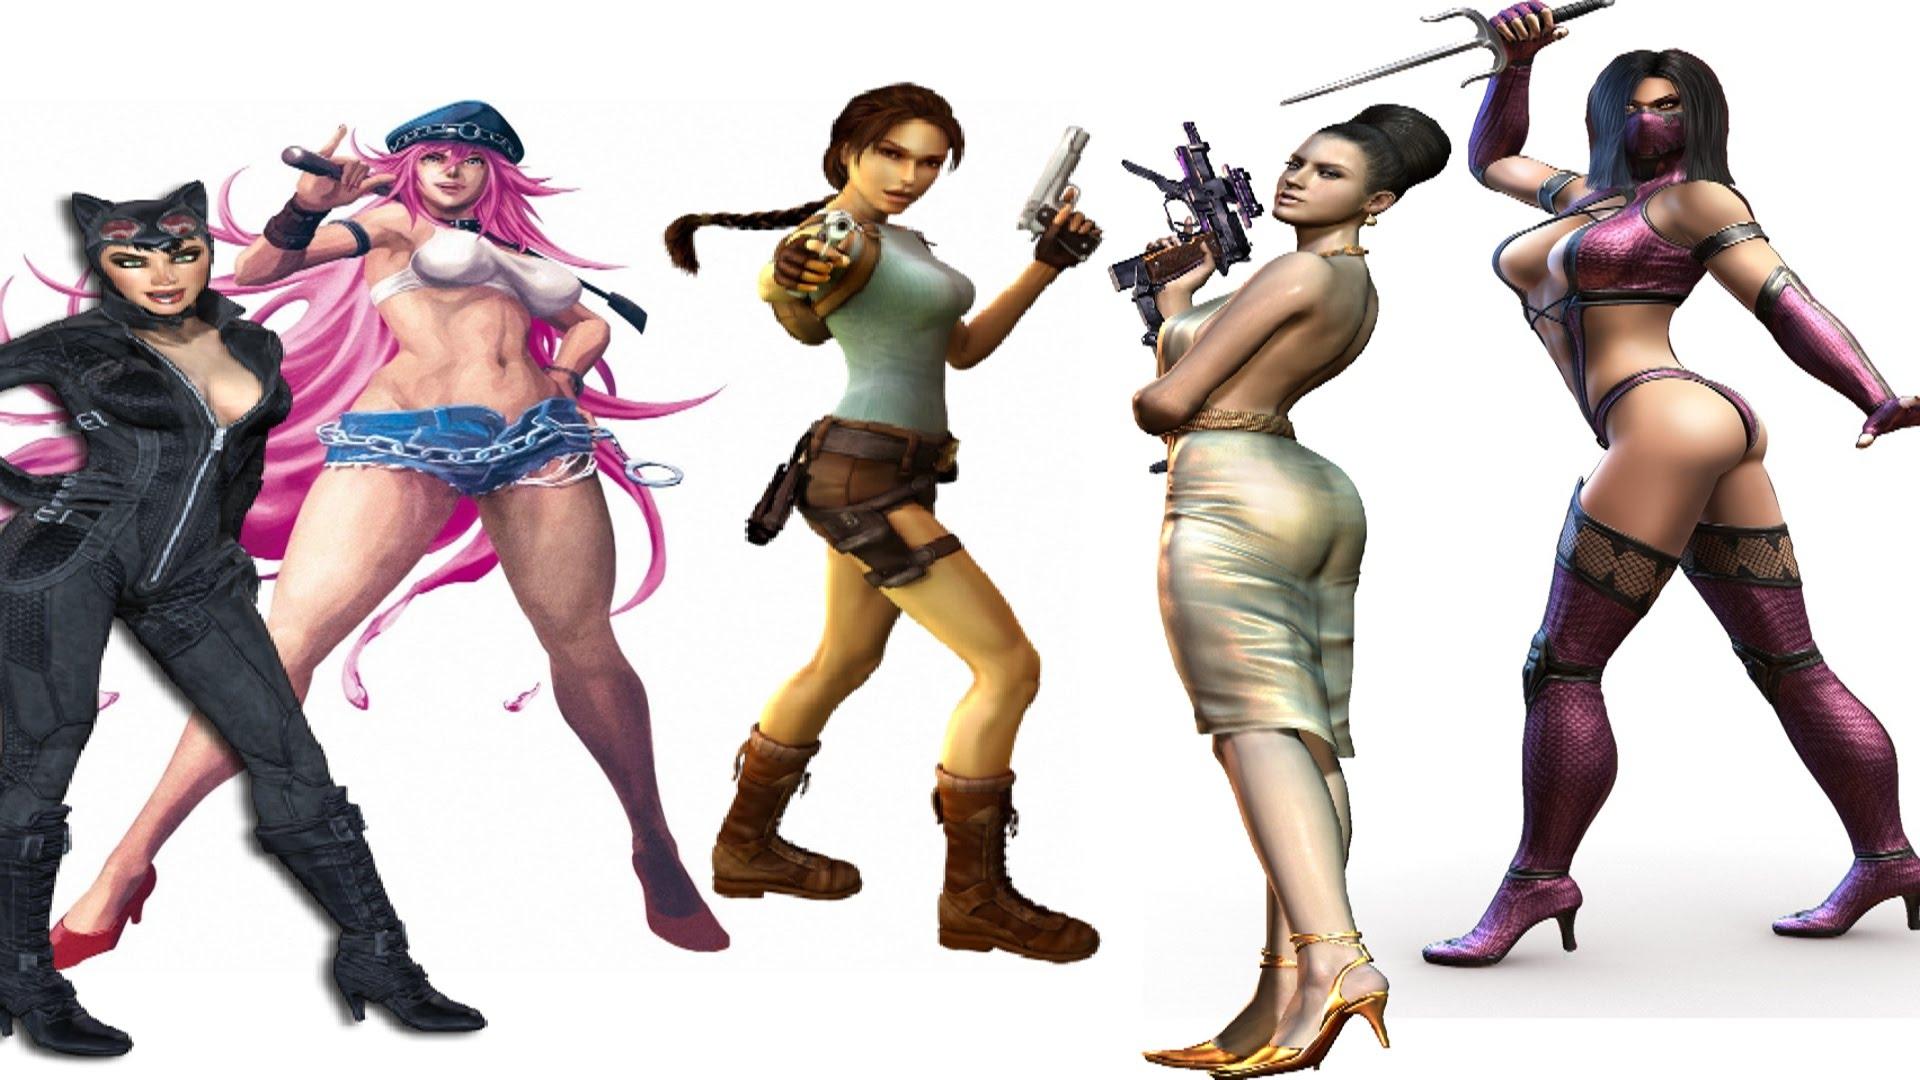 Hot Women of Video Games - Ftw Gallery | eBaum's World